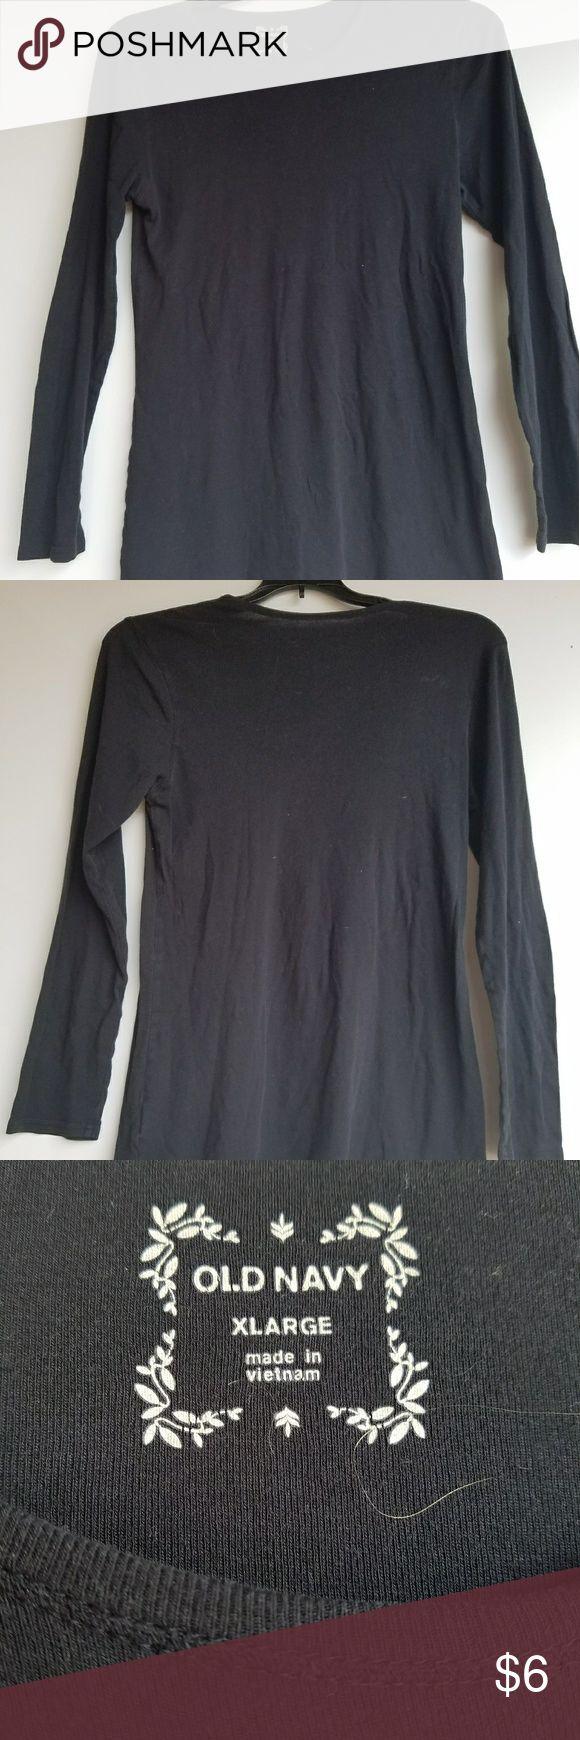 Black t shirt old navy -  Black Long Sleeved Old Navy Shirt